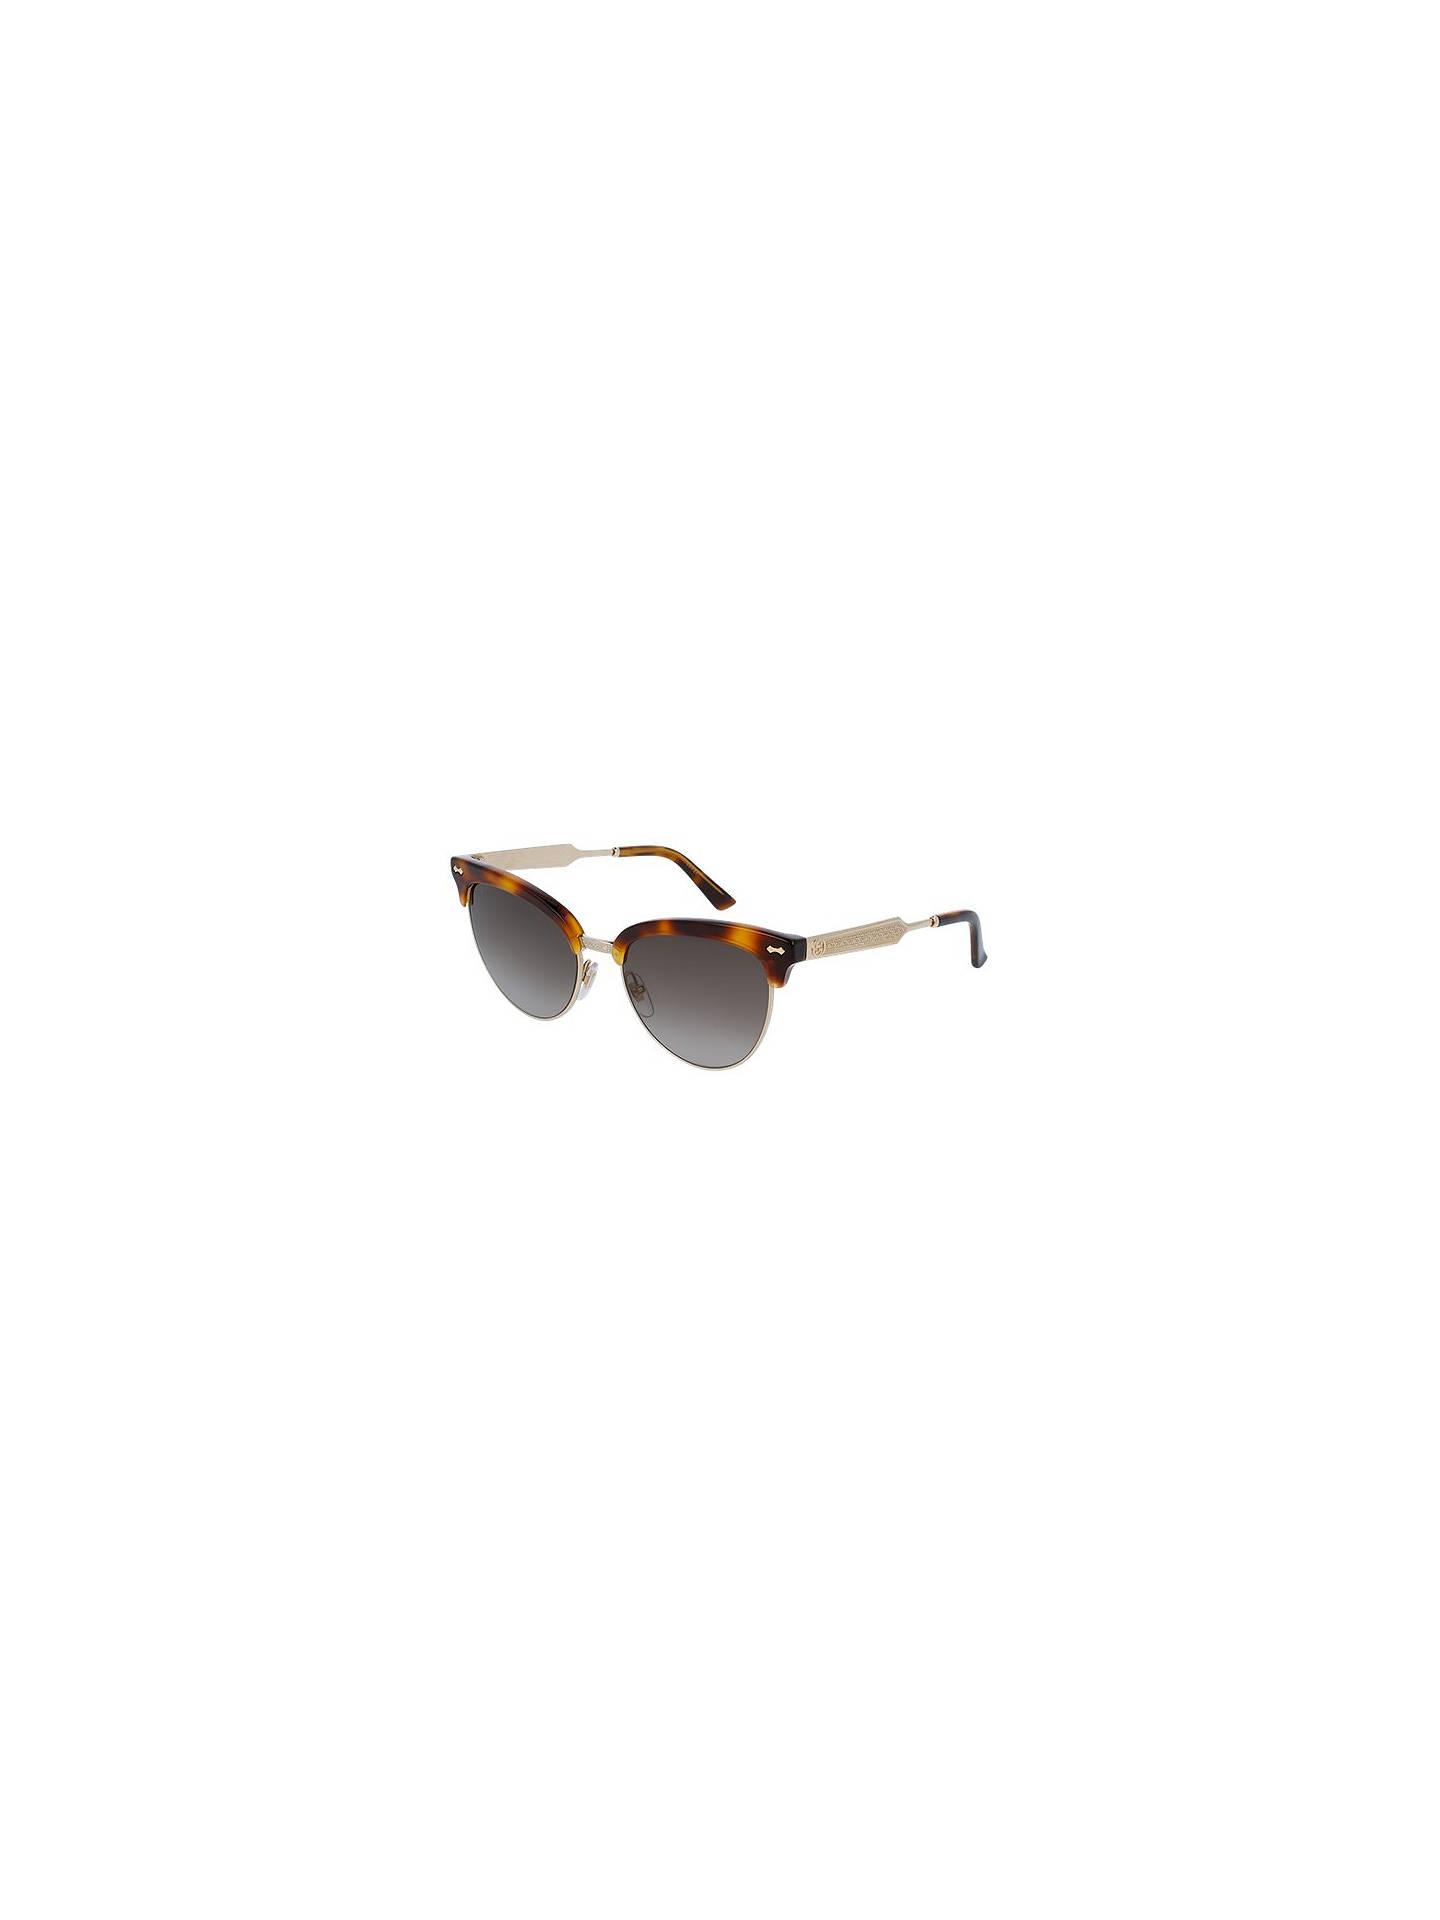 9ae1cca816eb6 Gucci GG 4283 S Embellished Cat s Eye Sunglasses at John Lewis ...